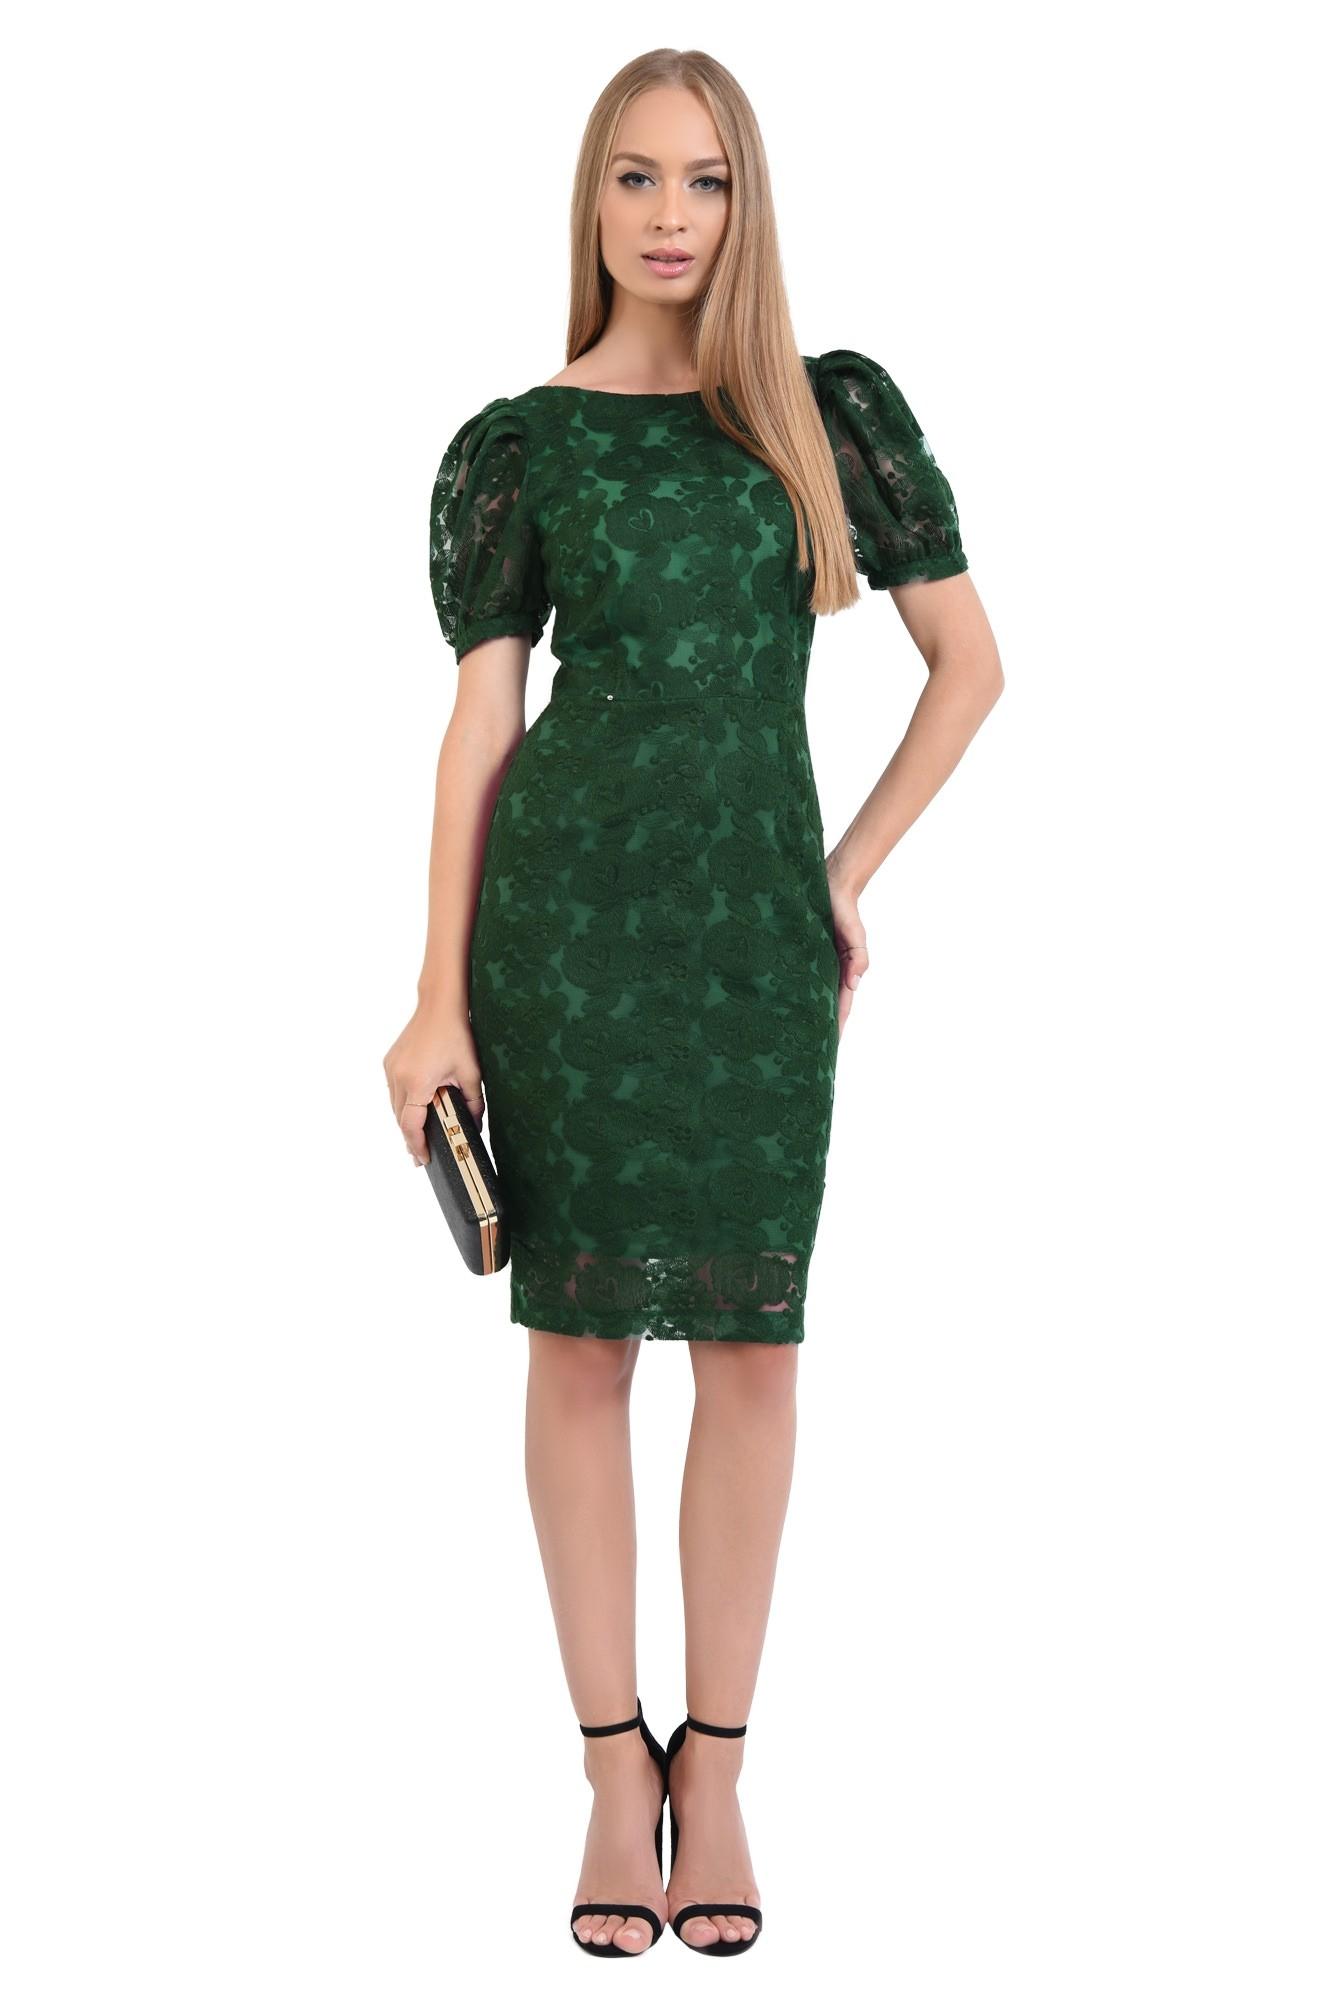 0 - rochie de seara, dantela, verde smarald, midi